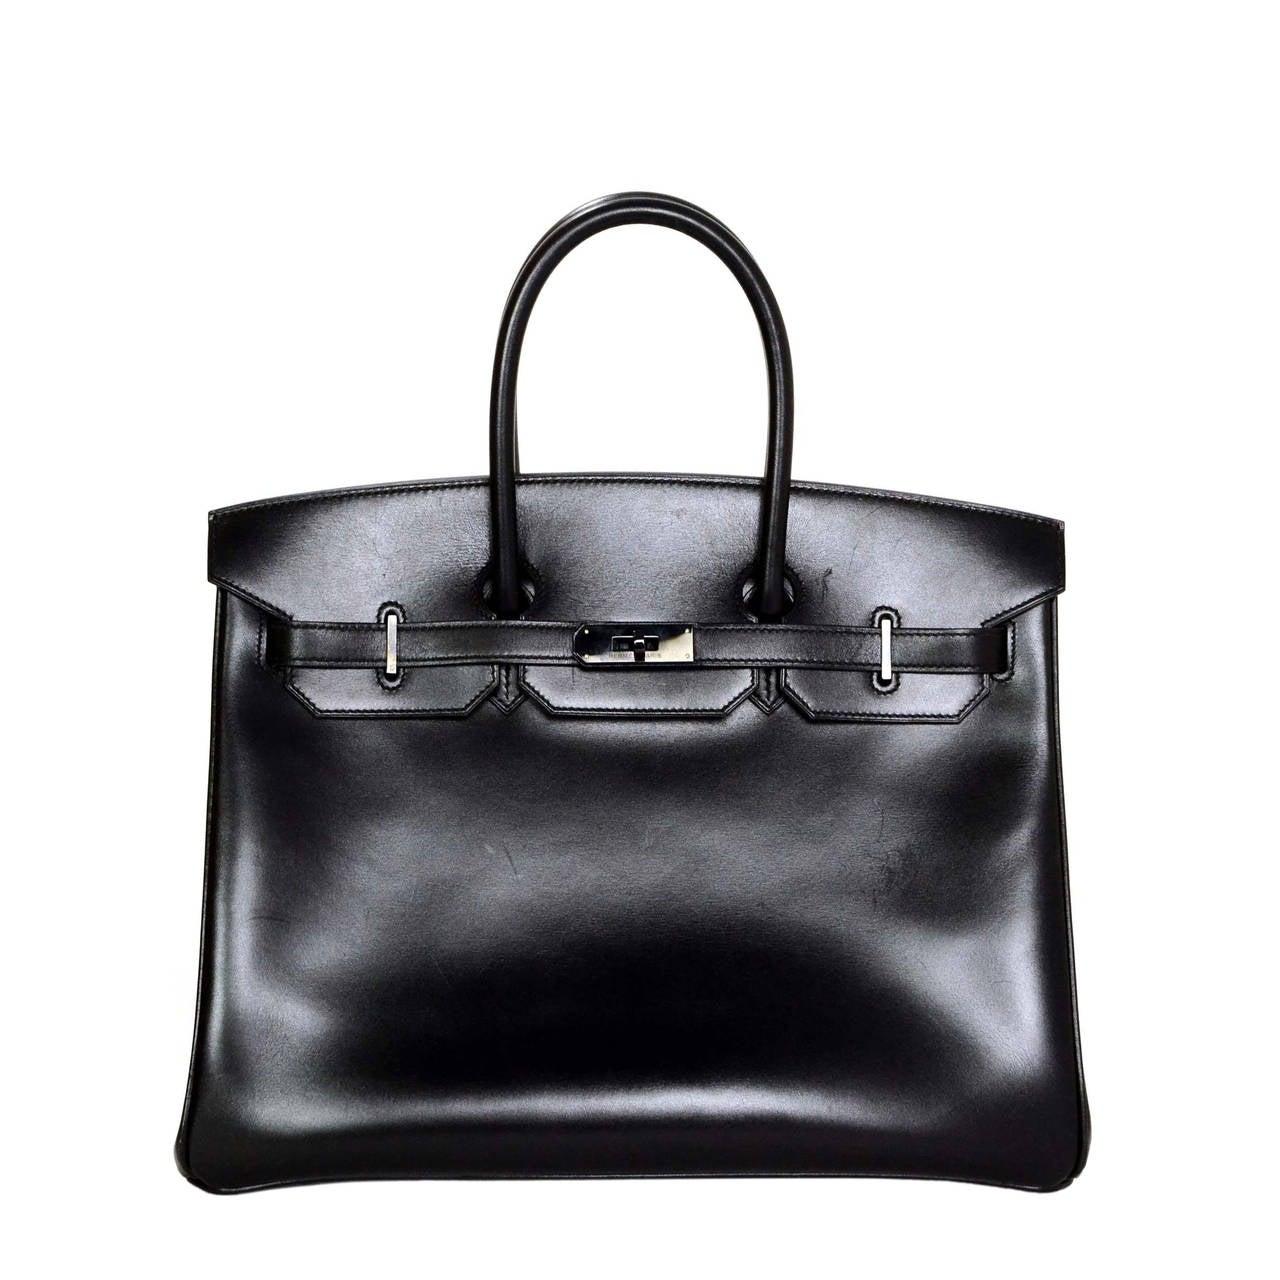 hermes pocketbook - HERMES Rare Black Box Leather Black Hardware SO BLACK 35 cm Birkin ...